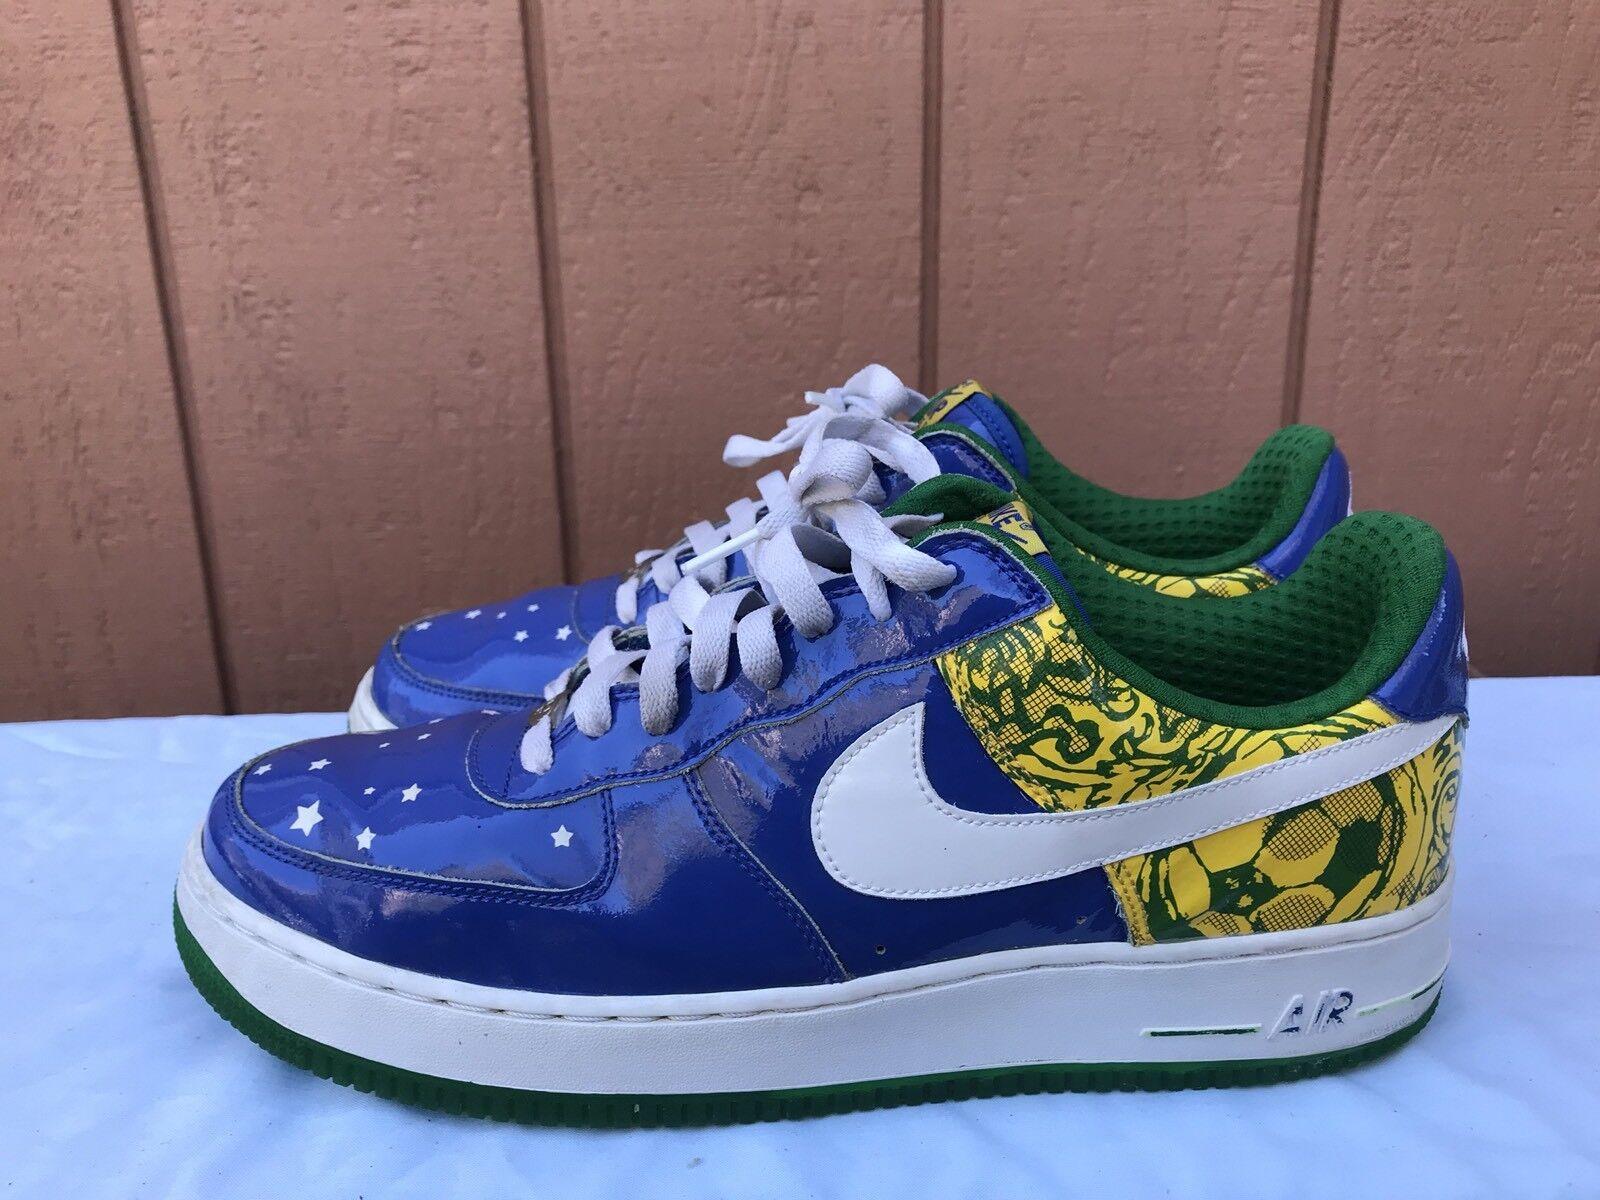 EUC Nike 313983-411 US 12.5 Air Force 1 Premium Ronaldinho Collection Royal A2